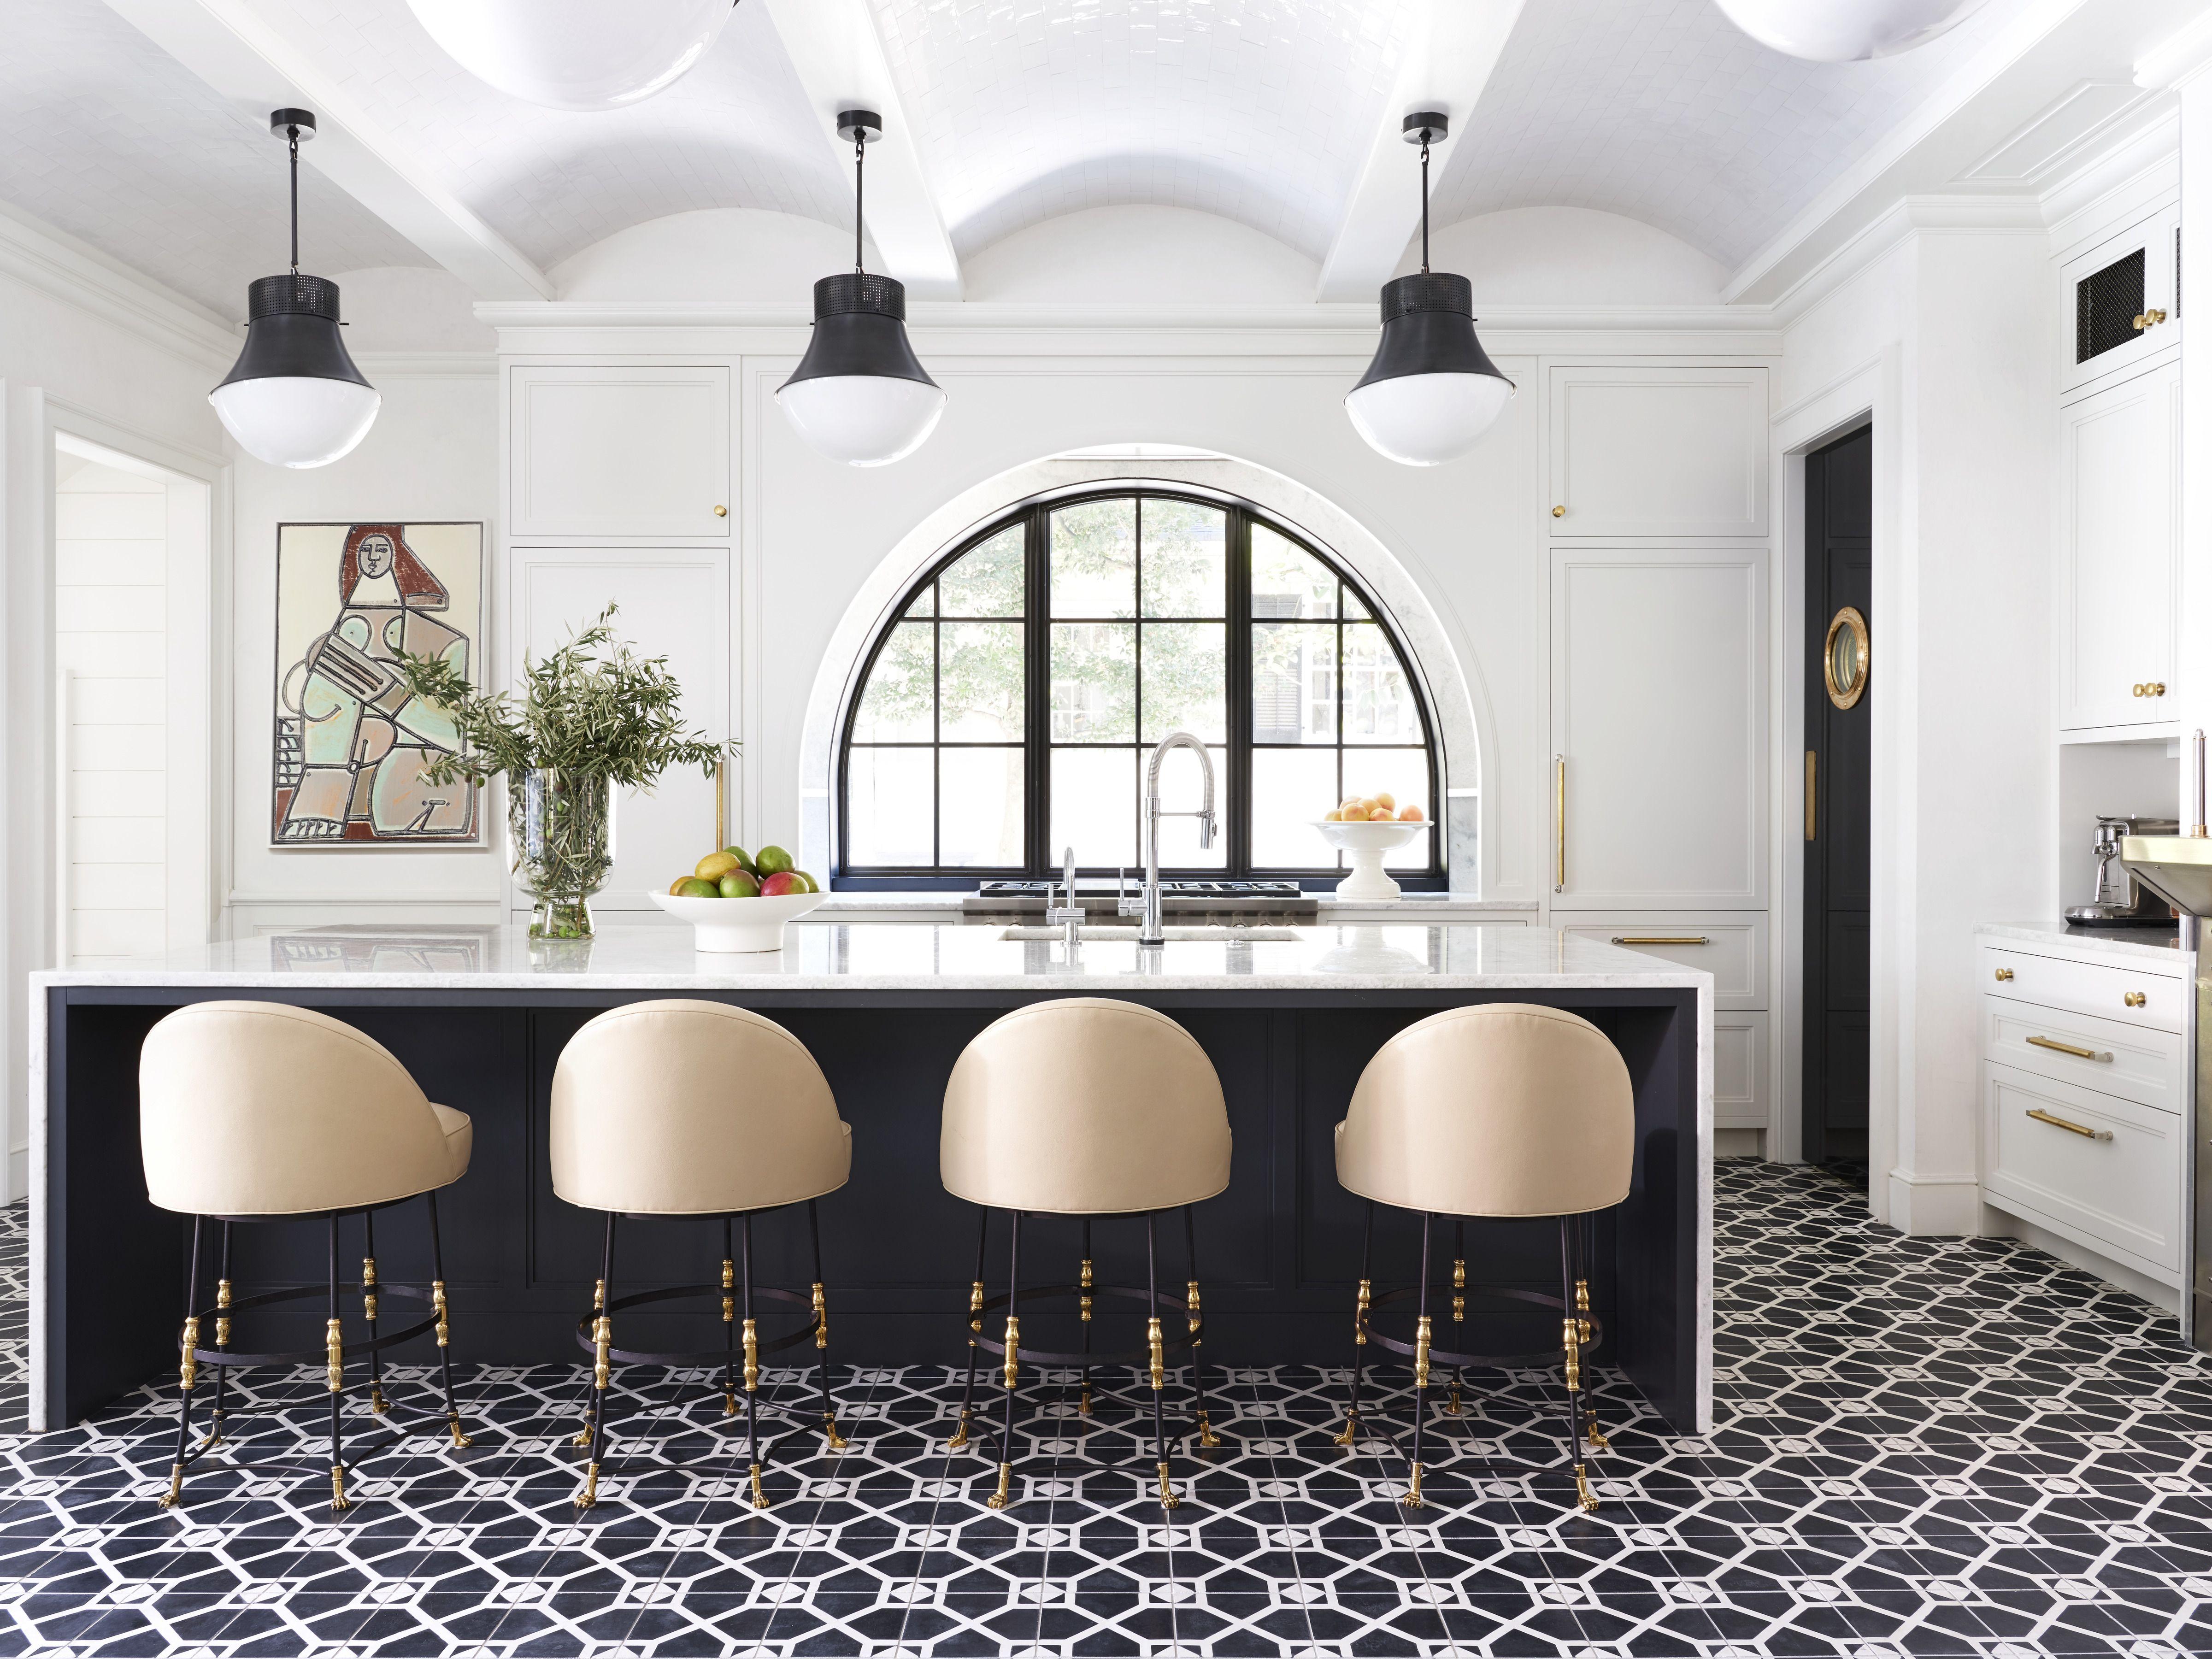 30 Best Kitchen Decor Ideas 2021 Decorating For The Kitchen